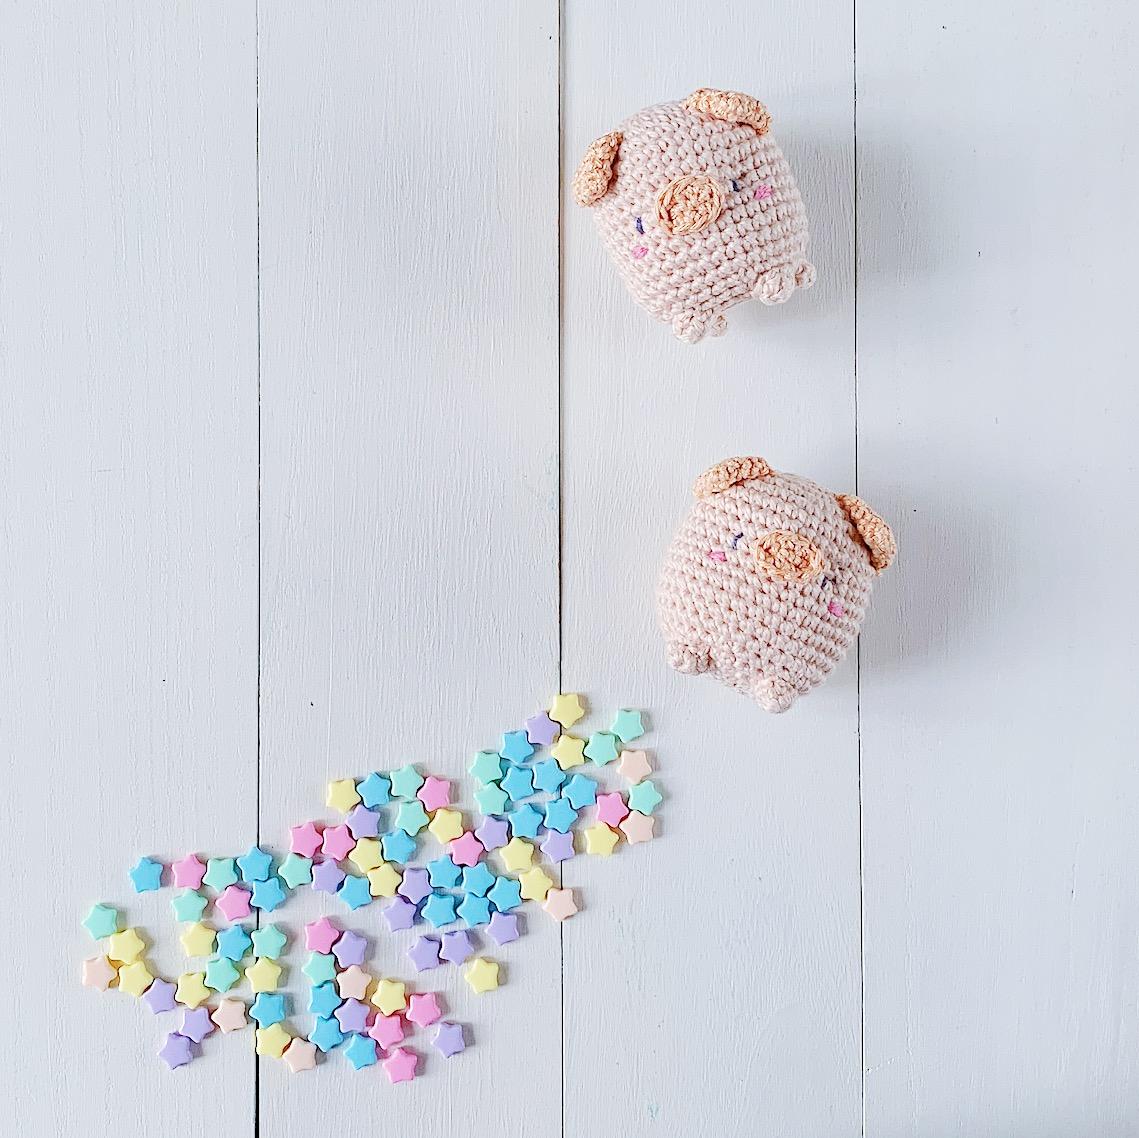 Amigurumi White Bear Free Crochet Pattern - Amigurumi Patterns Pic2re | 1138x1139